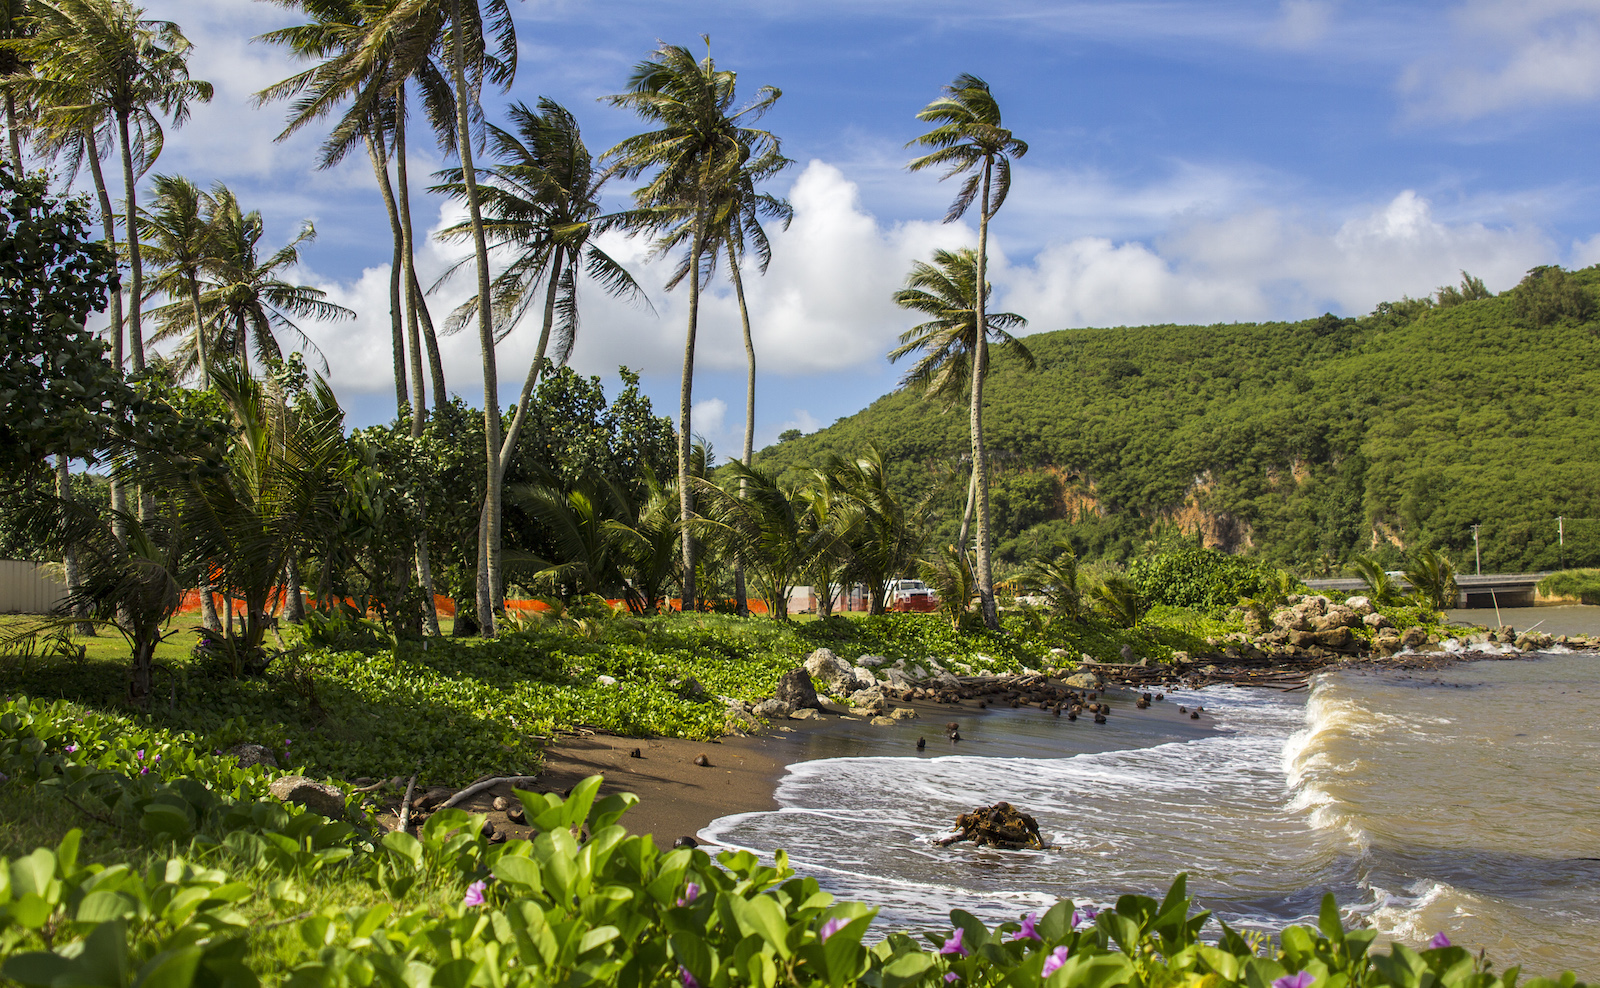 Talofofo Bay Beach Guam